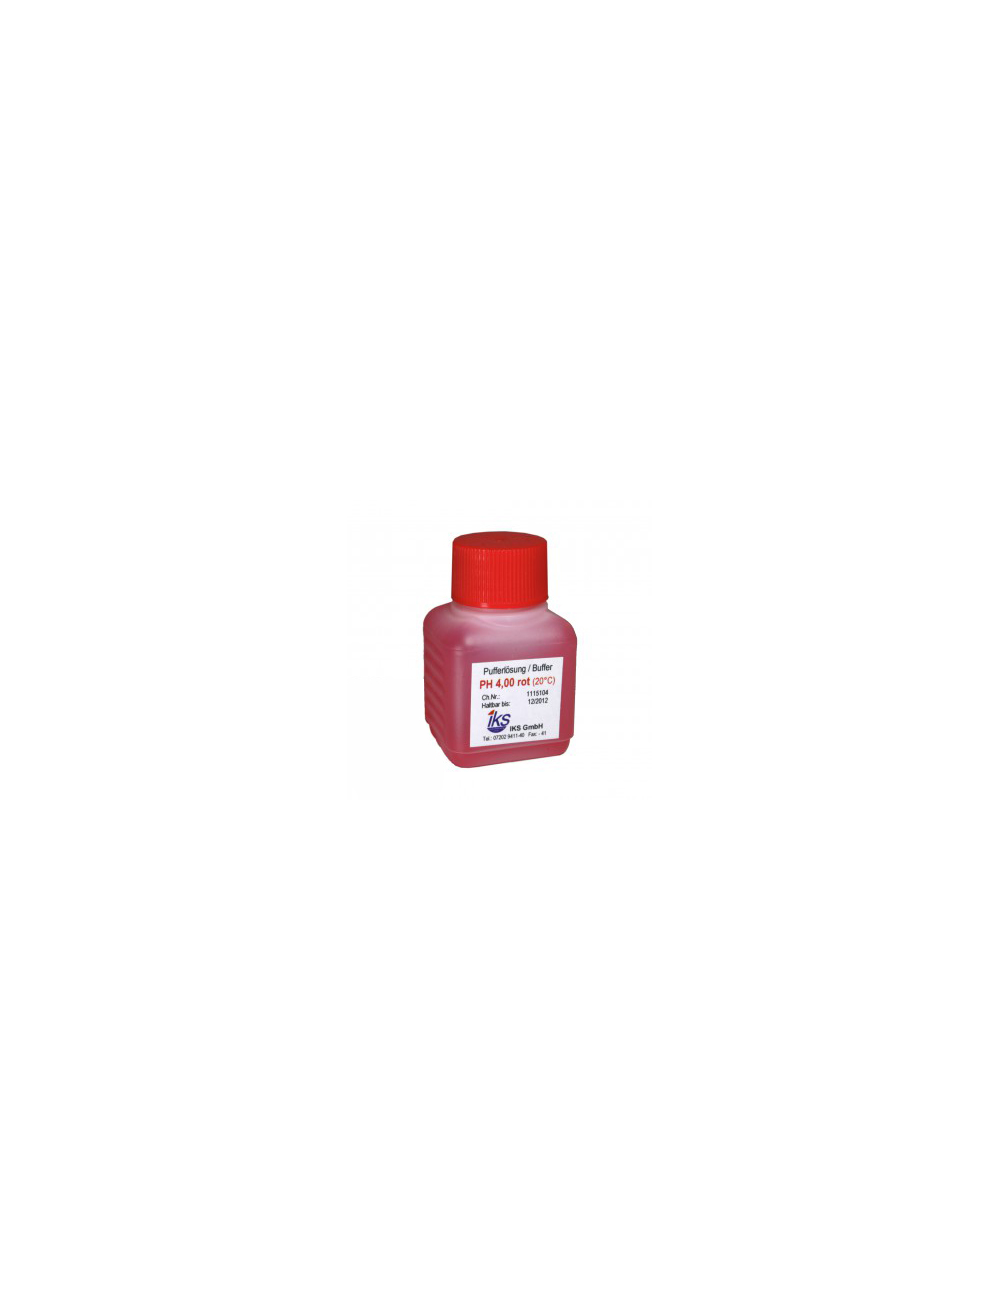 IKS - solution de calibrage ph 4.0